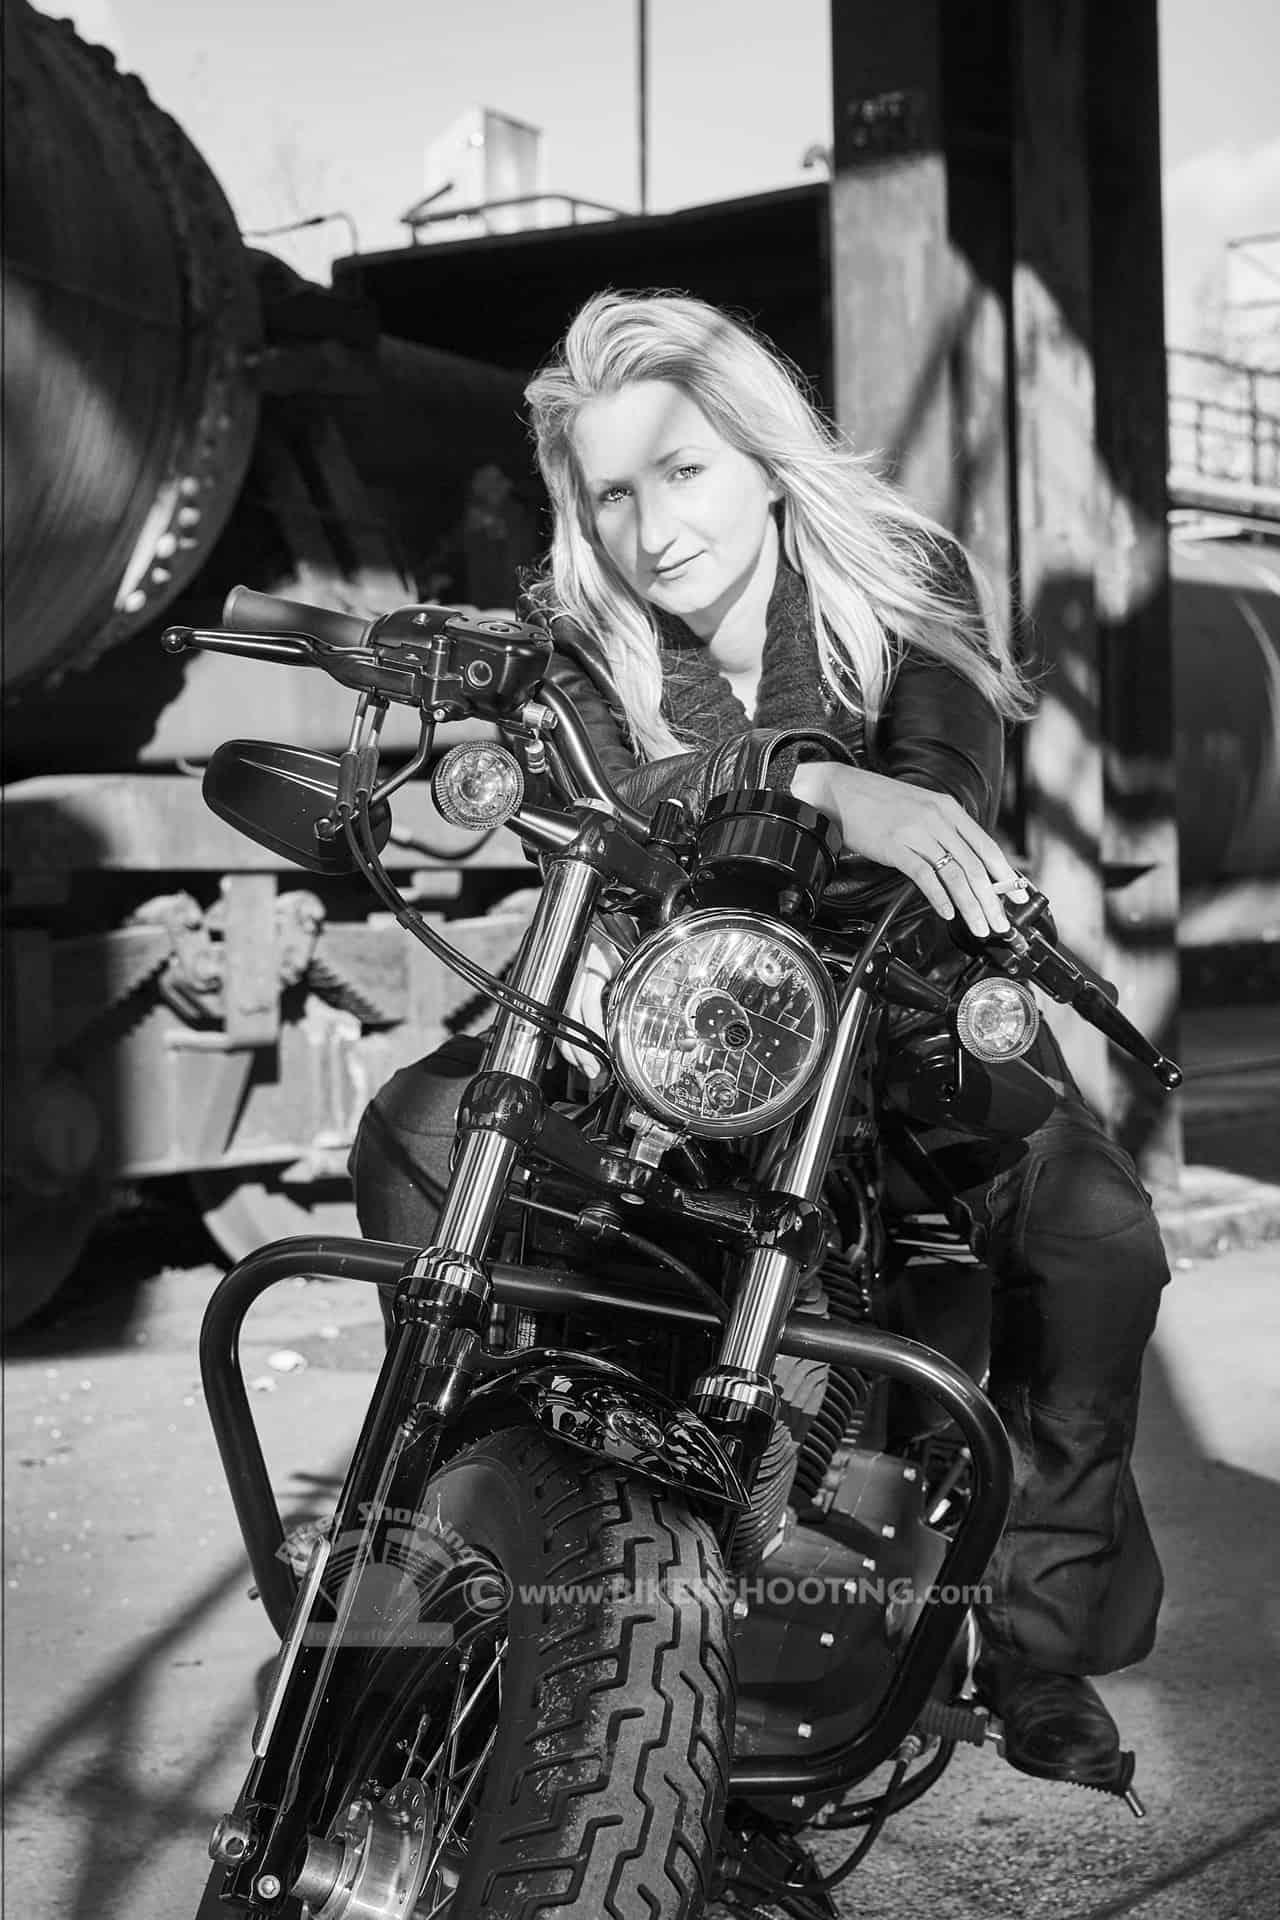 Biker Fotoshooting LADY Fotoshooting